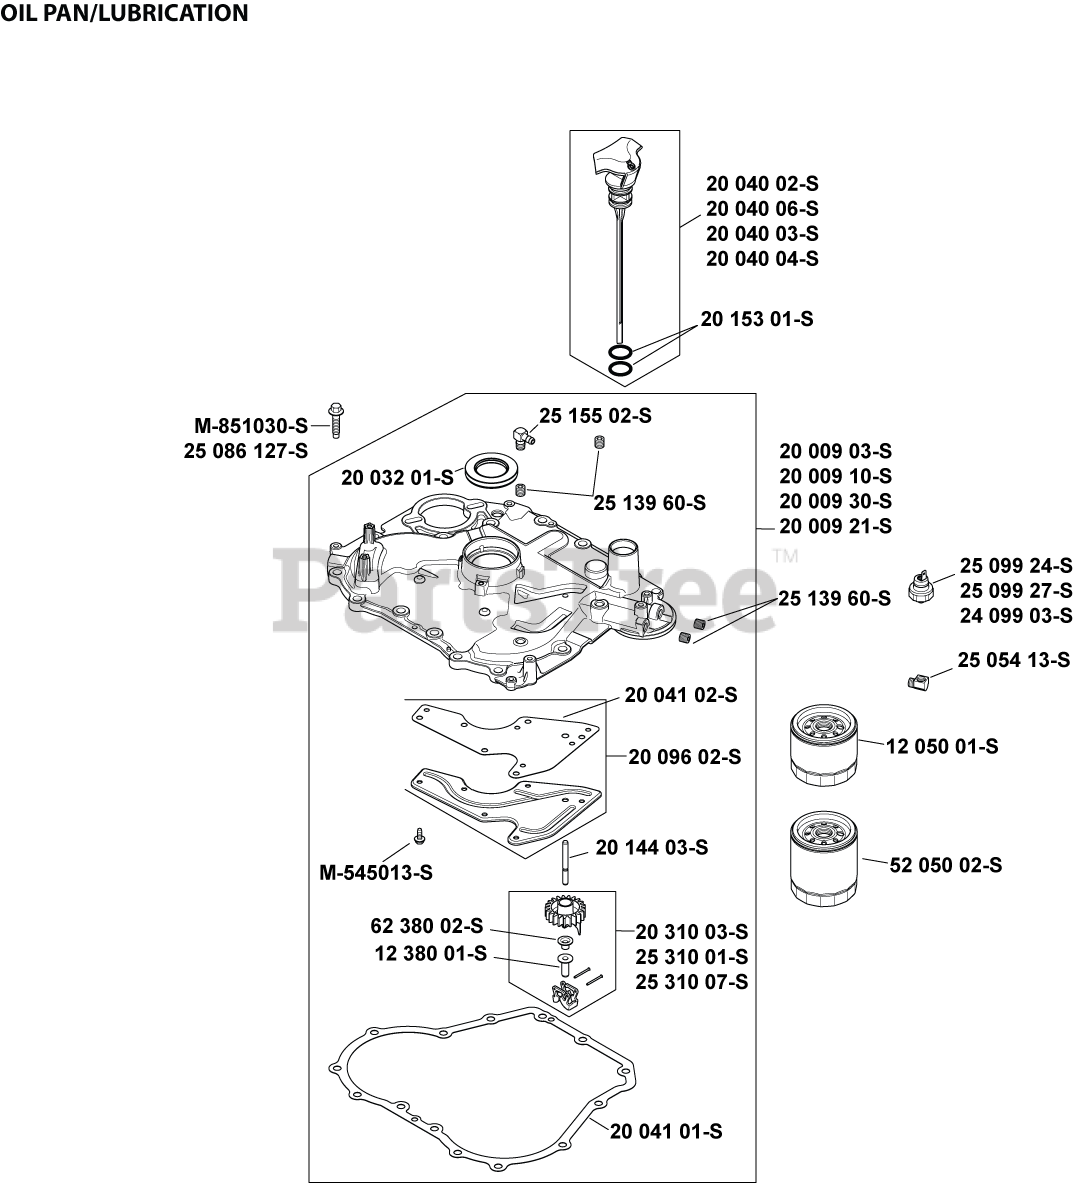 Kohler SV600-3223 - Kohler Courage Single Engine, Made for MTD, 20hp,  14.9kW Oil Pan/Lubrication 3-20-25 Parts Lookup with Diagrams | PartsTreePartsTree